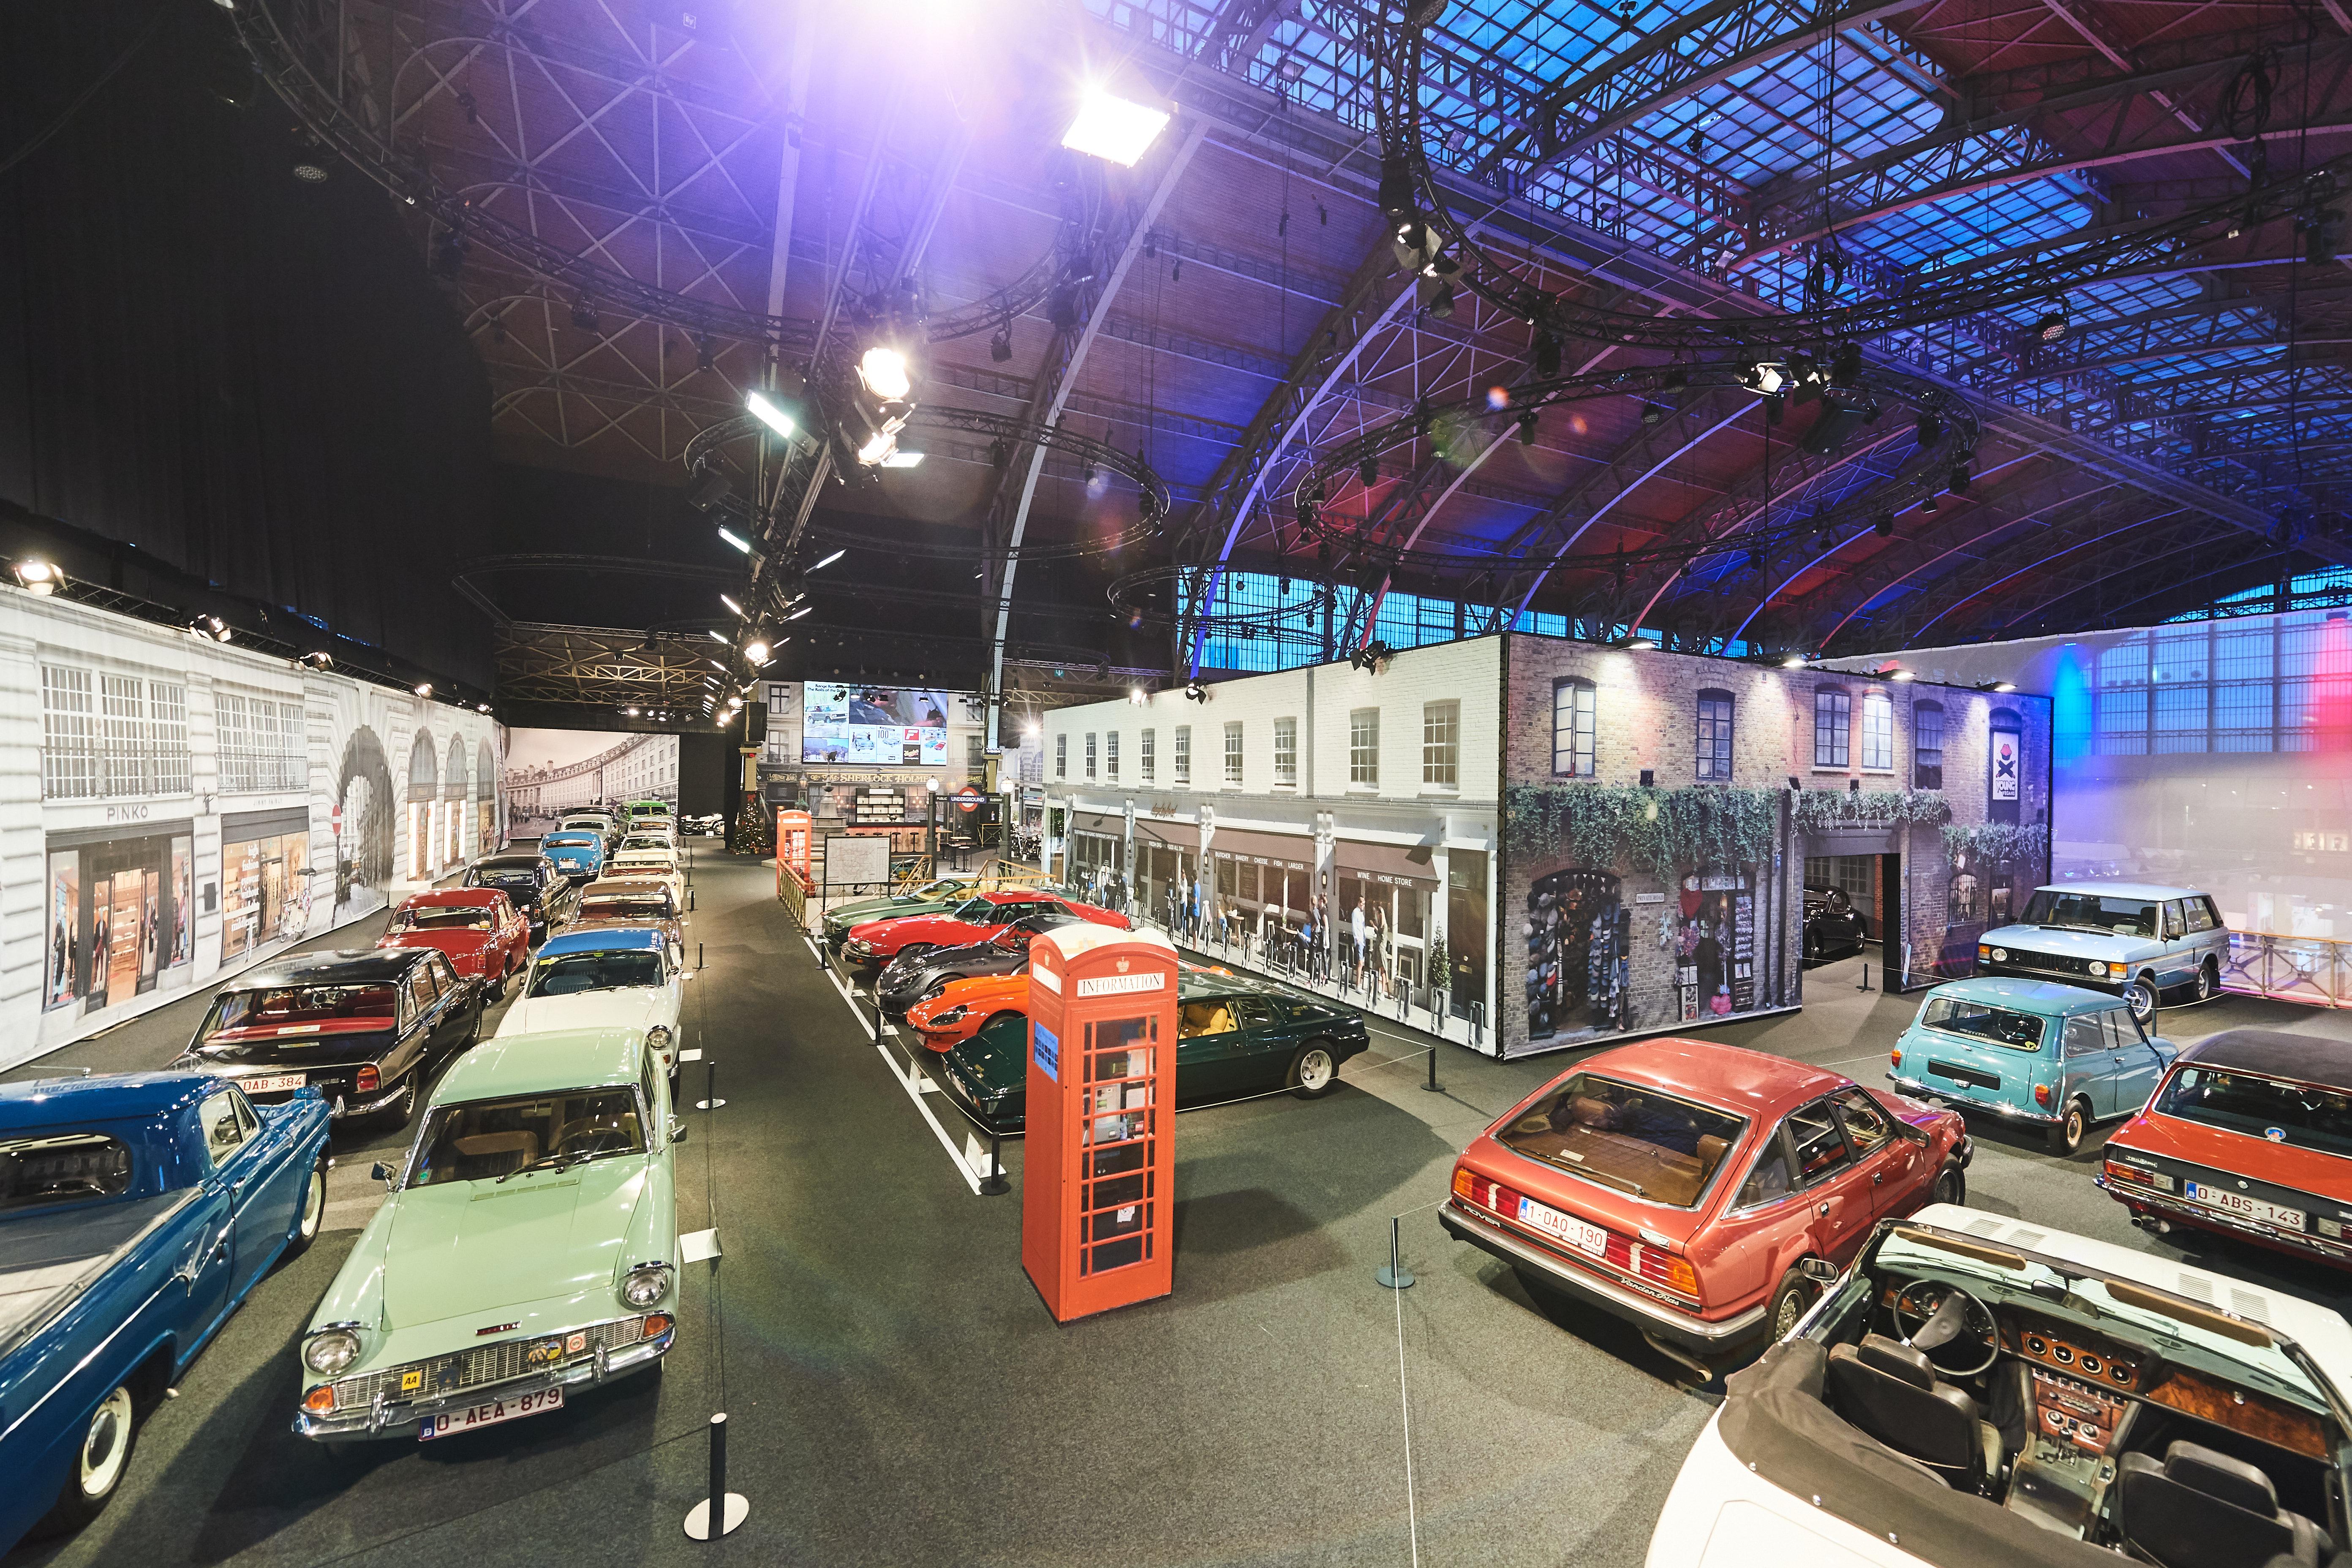 191212-Autoworld-So-British! exposition 04